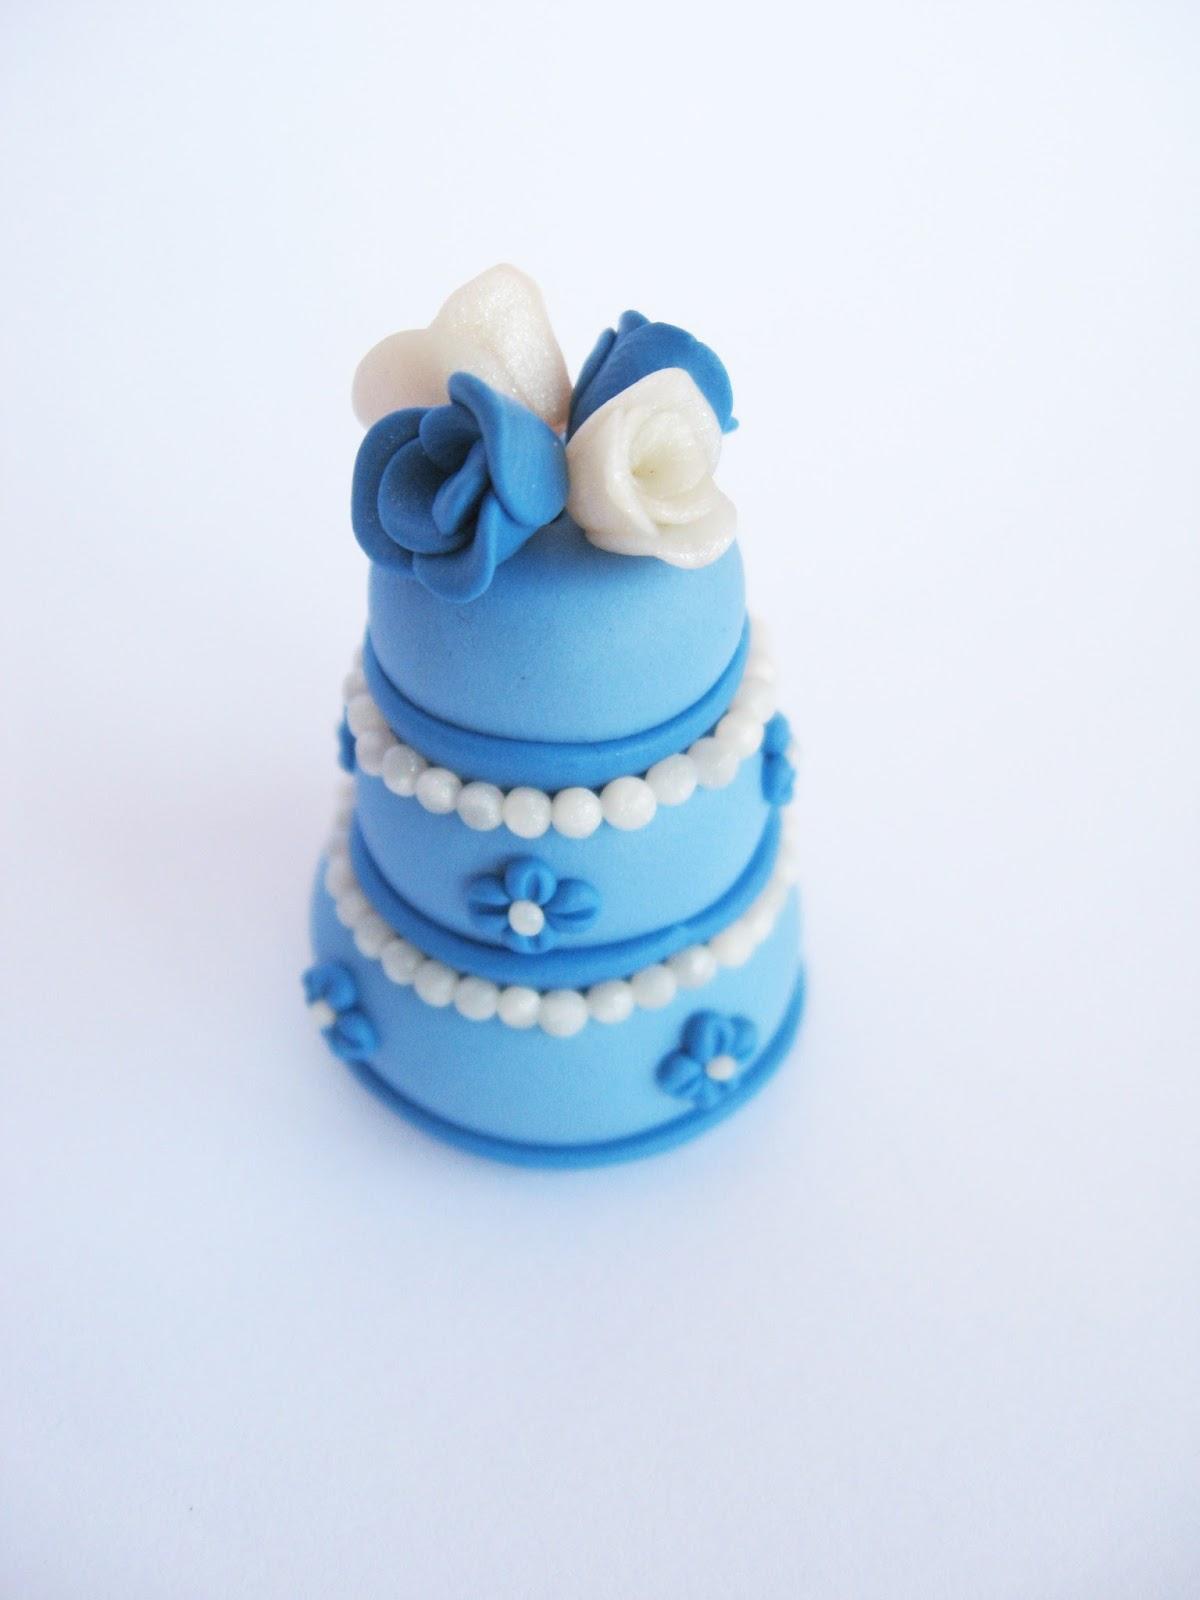 gâteau pièce montée bleu